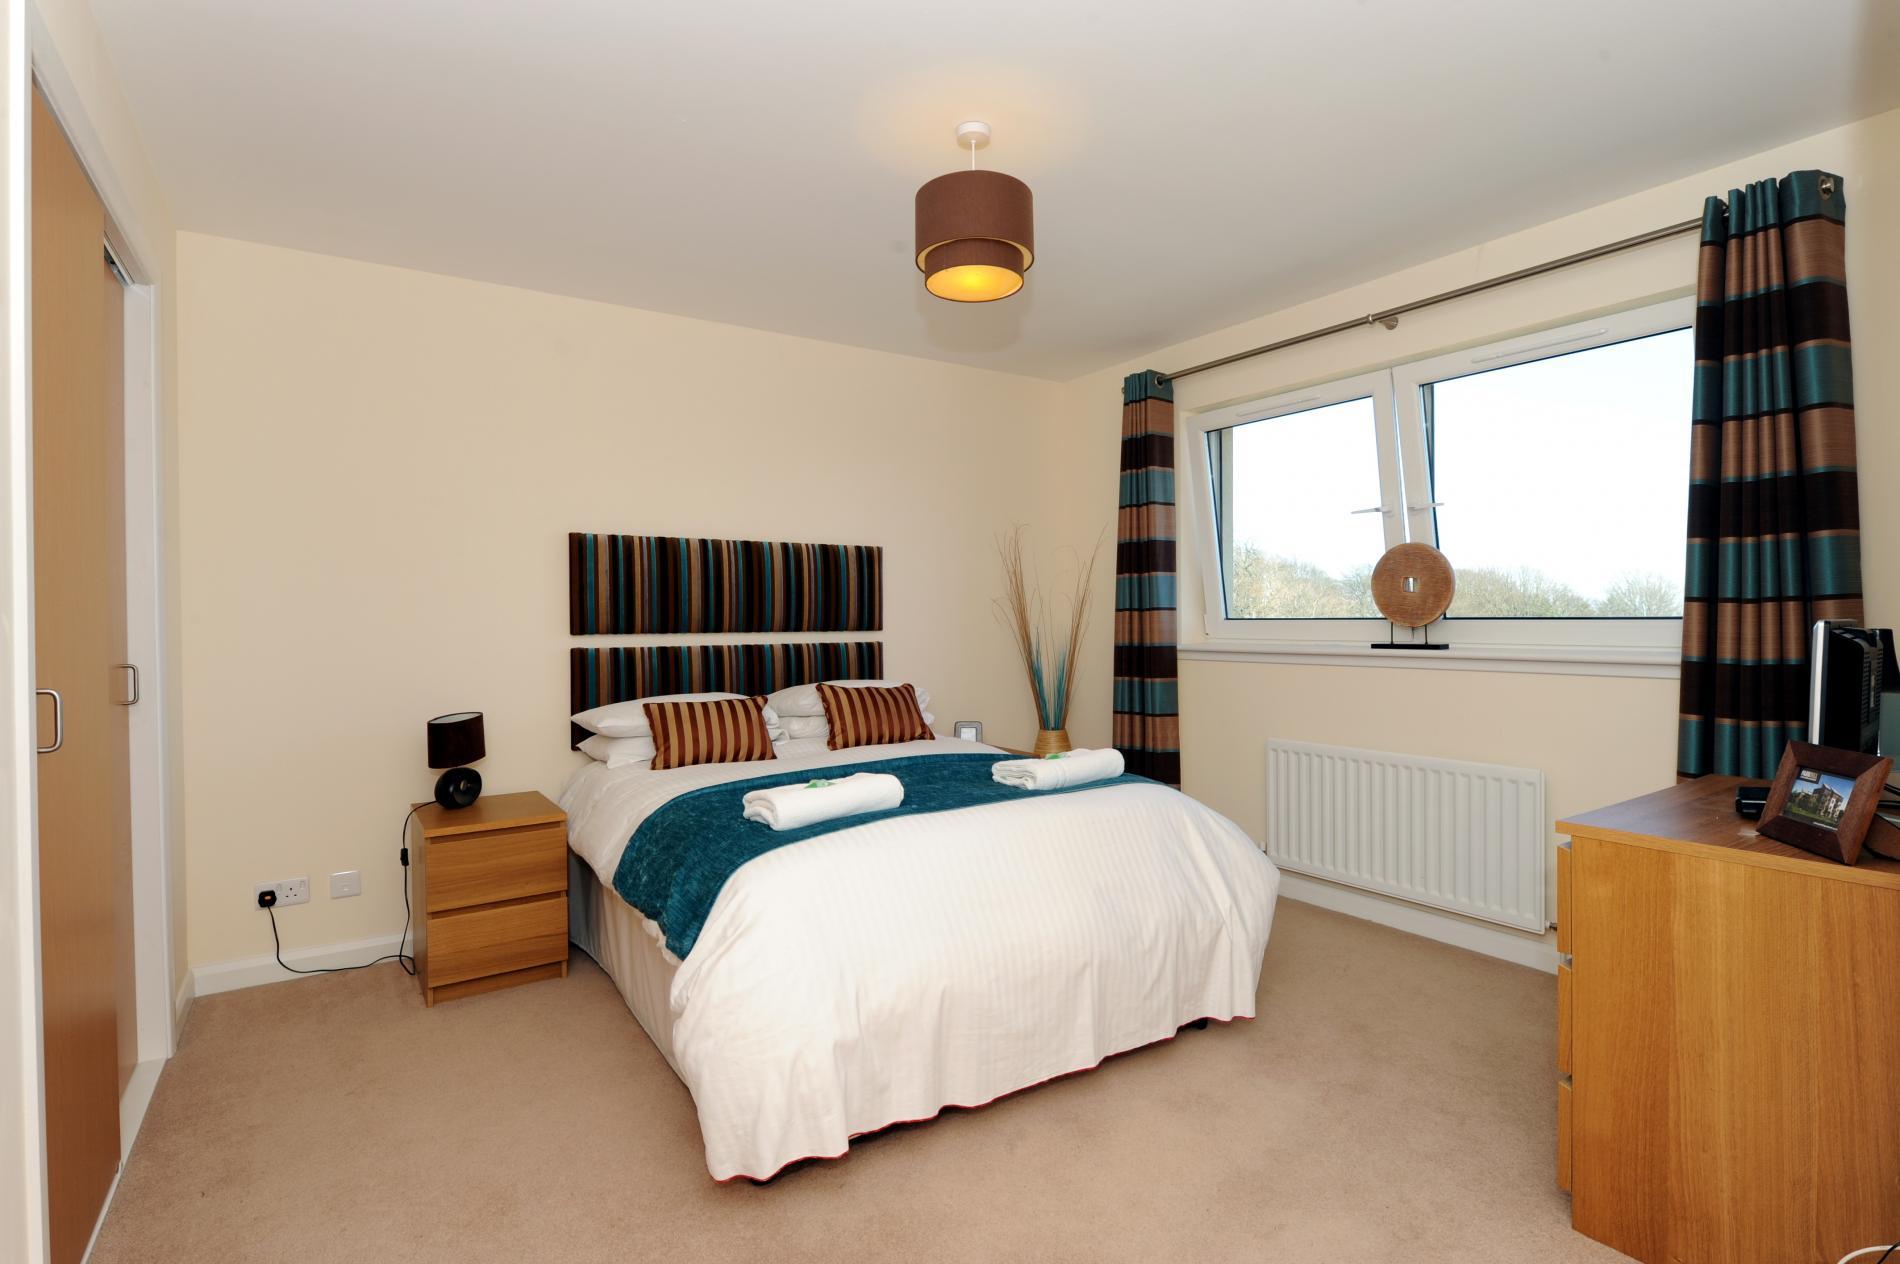 Parkhill Luxury Serviced Apartments VisitAberdeenshire